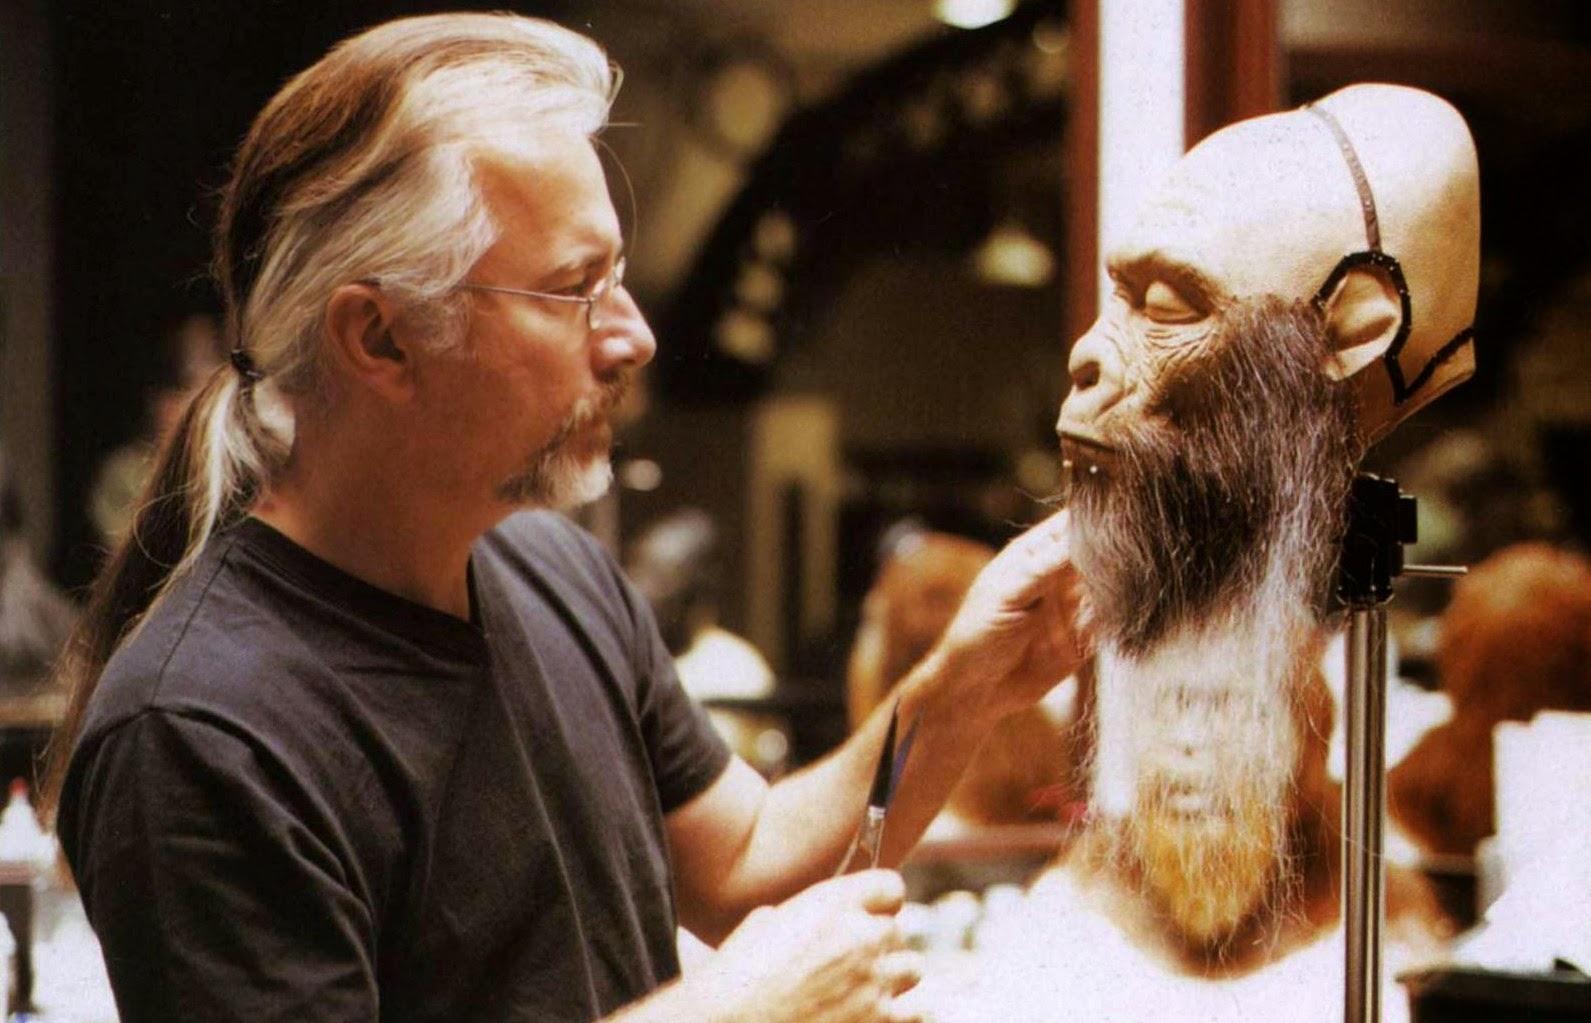 SENIOR MEDIA THESIS: Rick Baker: Special Effects Makeup Artist